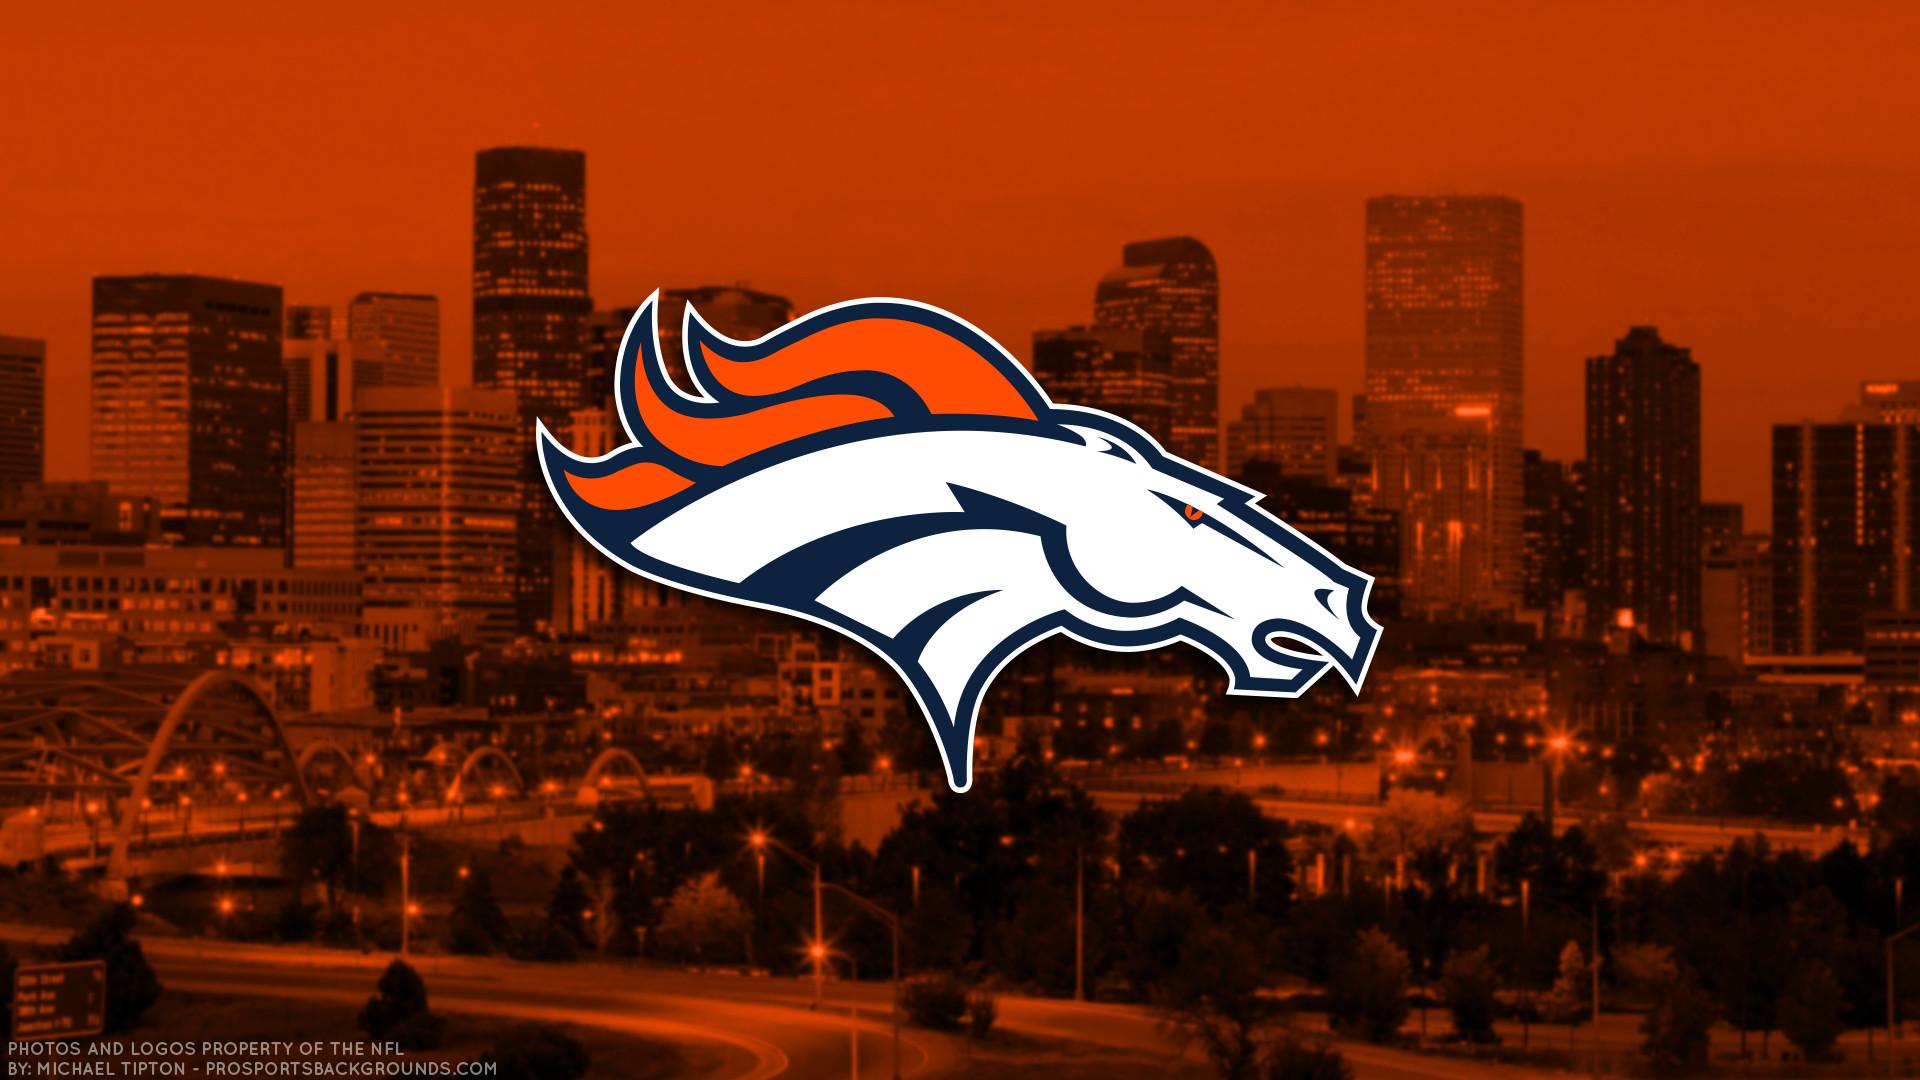 Res: 1920x1080, ... Denver Broncos 2017 football logo wallpaper pc desktop computer